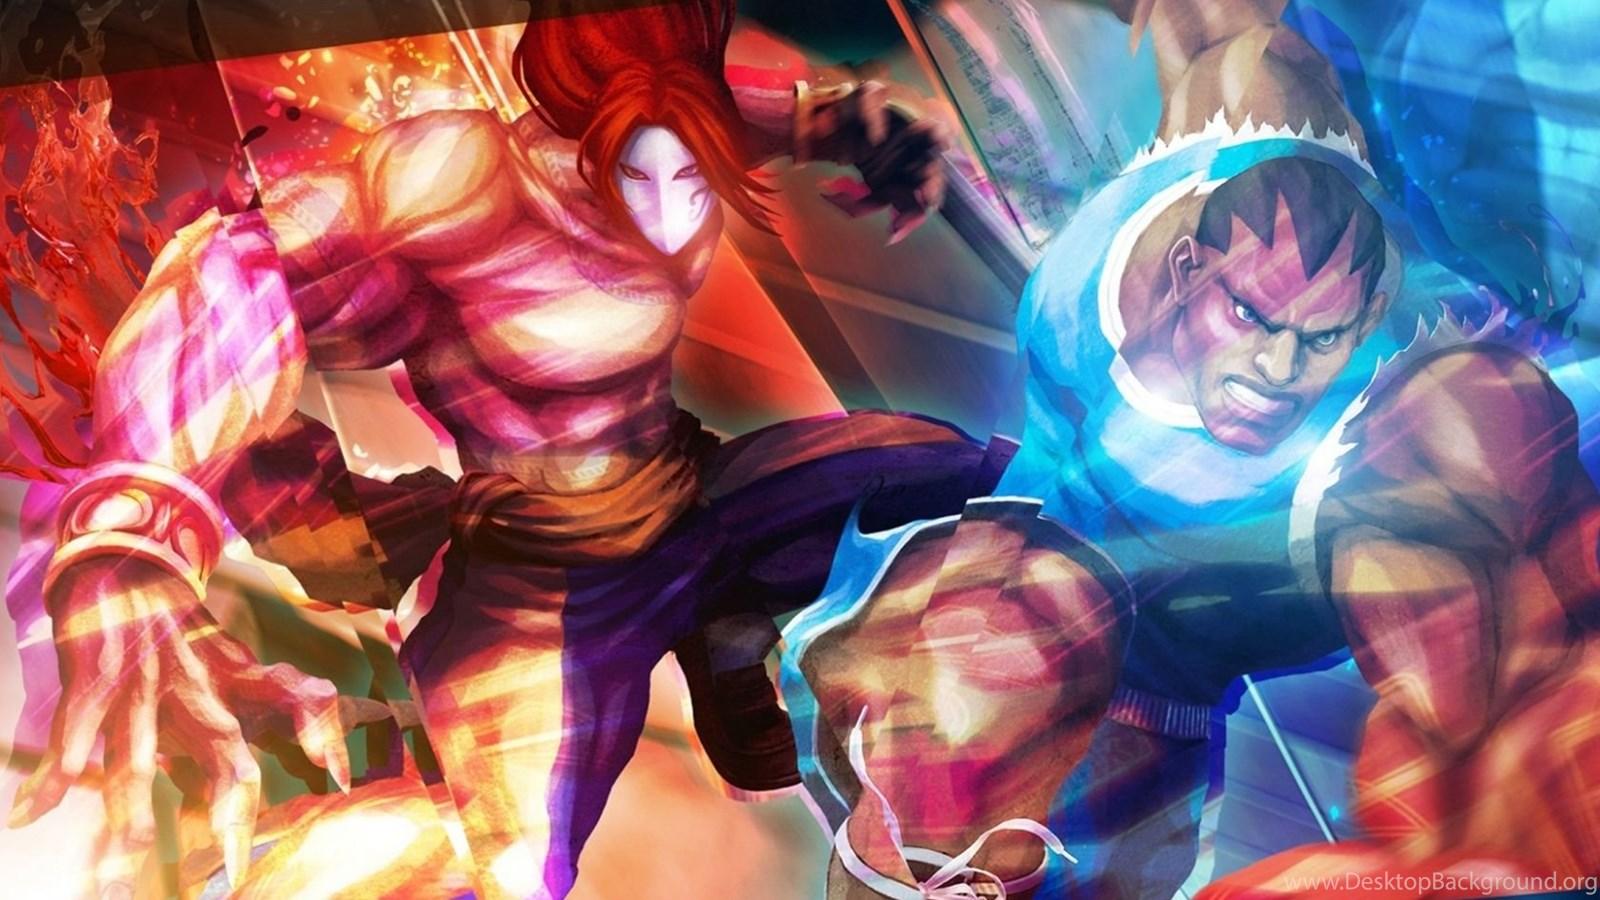 Street Fighter X Tekken Street Fighter Wallpapers 38492015